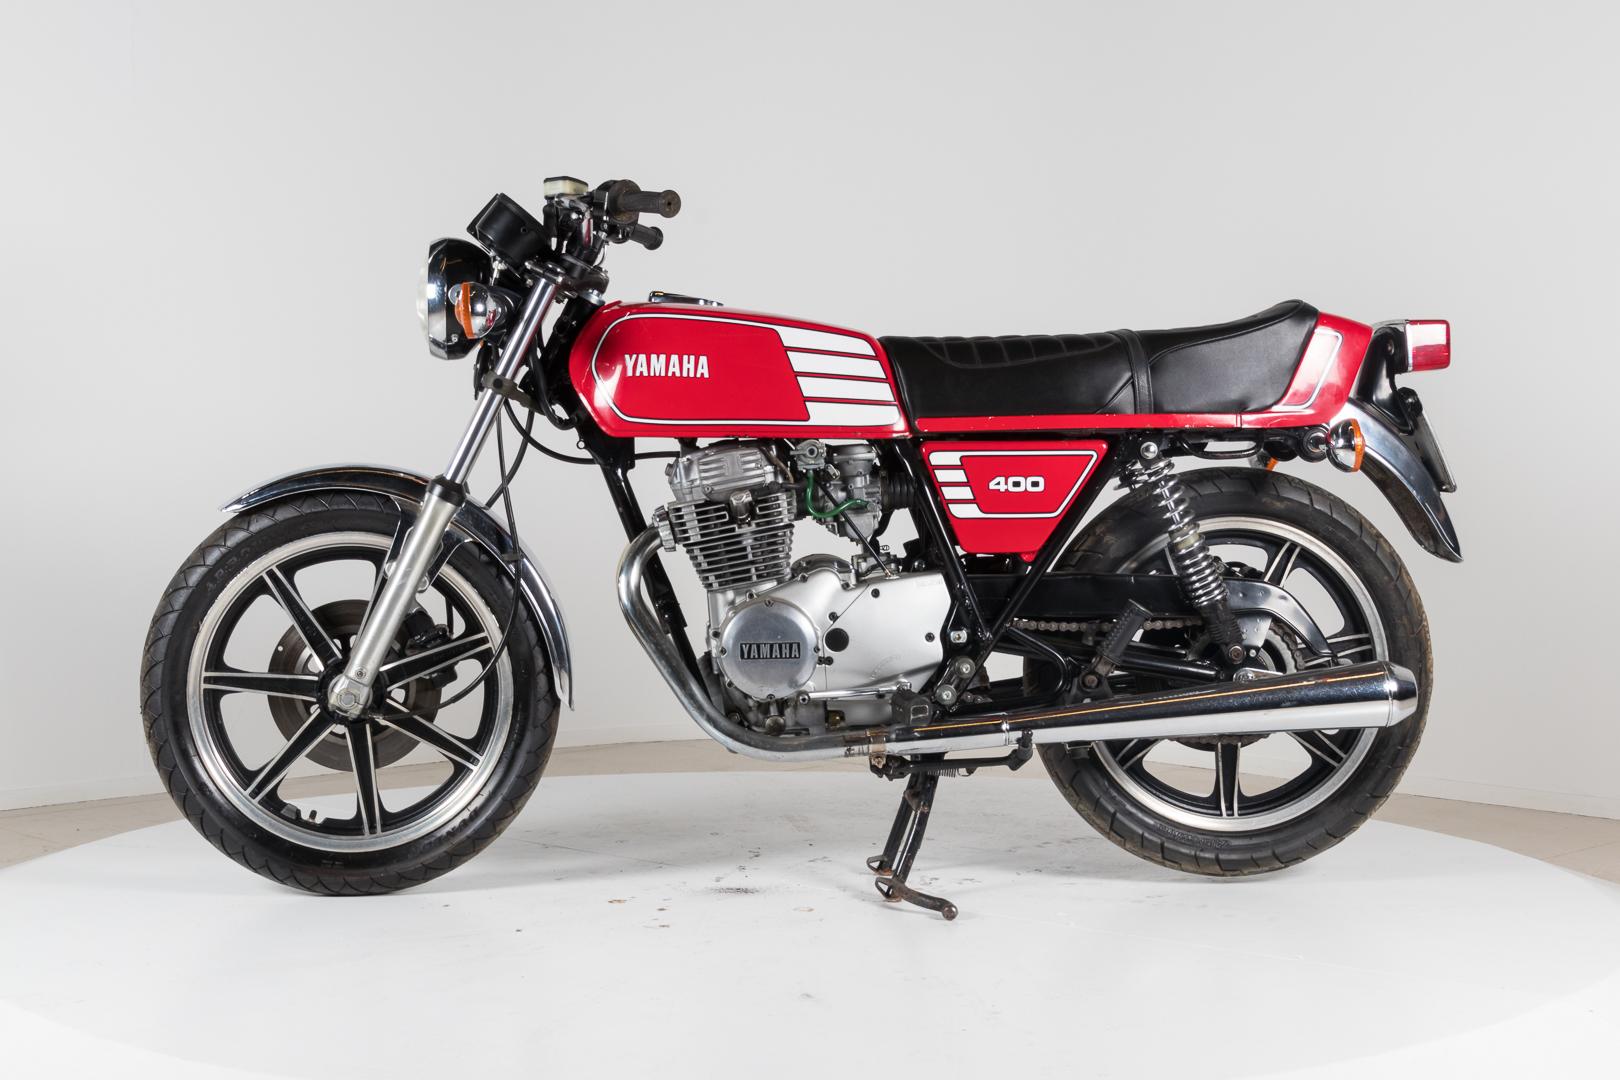 1980 yamaha xs 400 yamaha classic motorbikes ruote. Black Bedroom Furniture Sets. Home Design Ideas